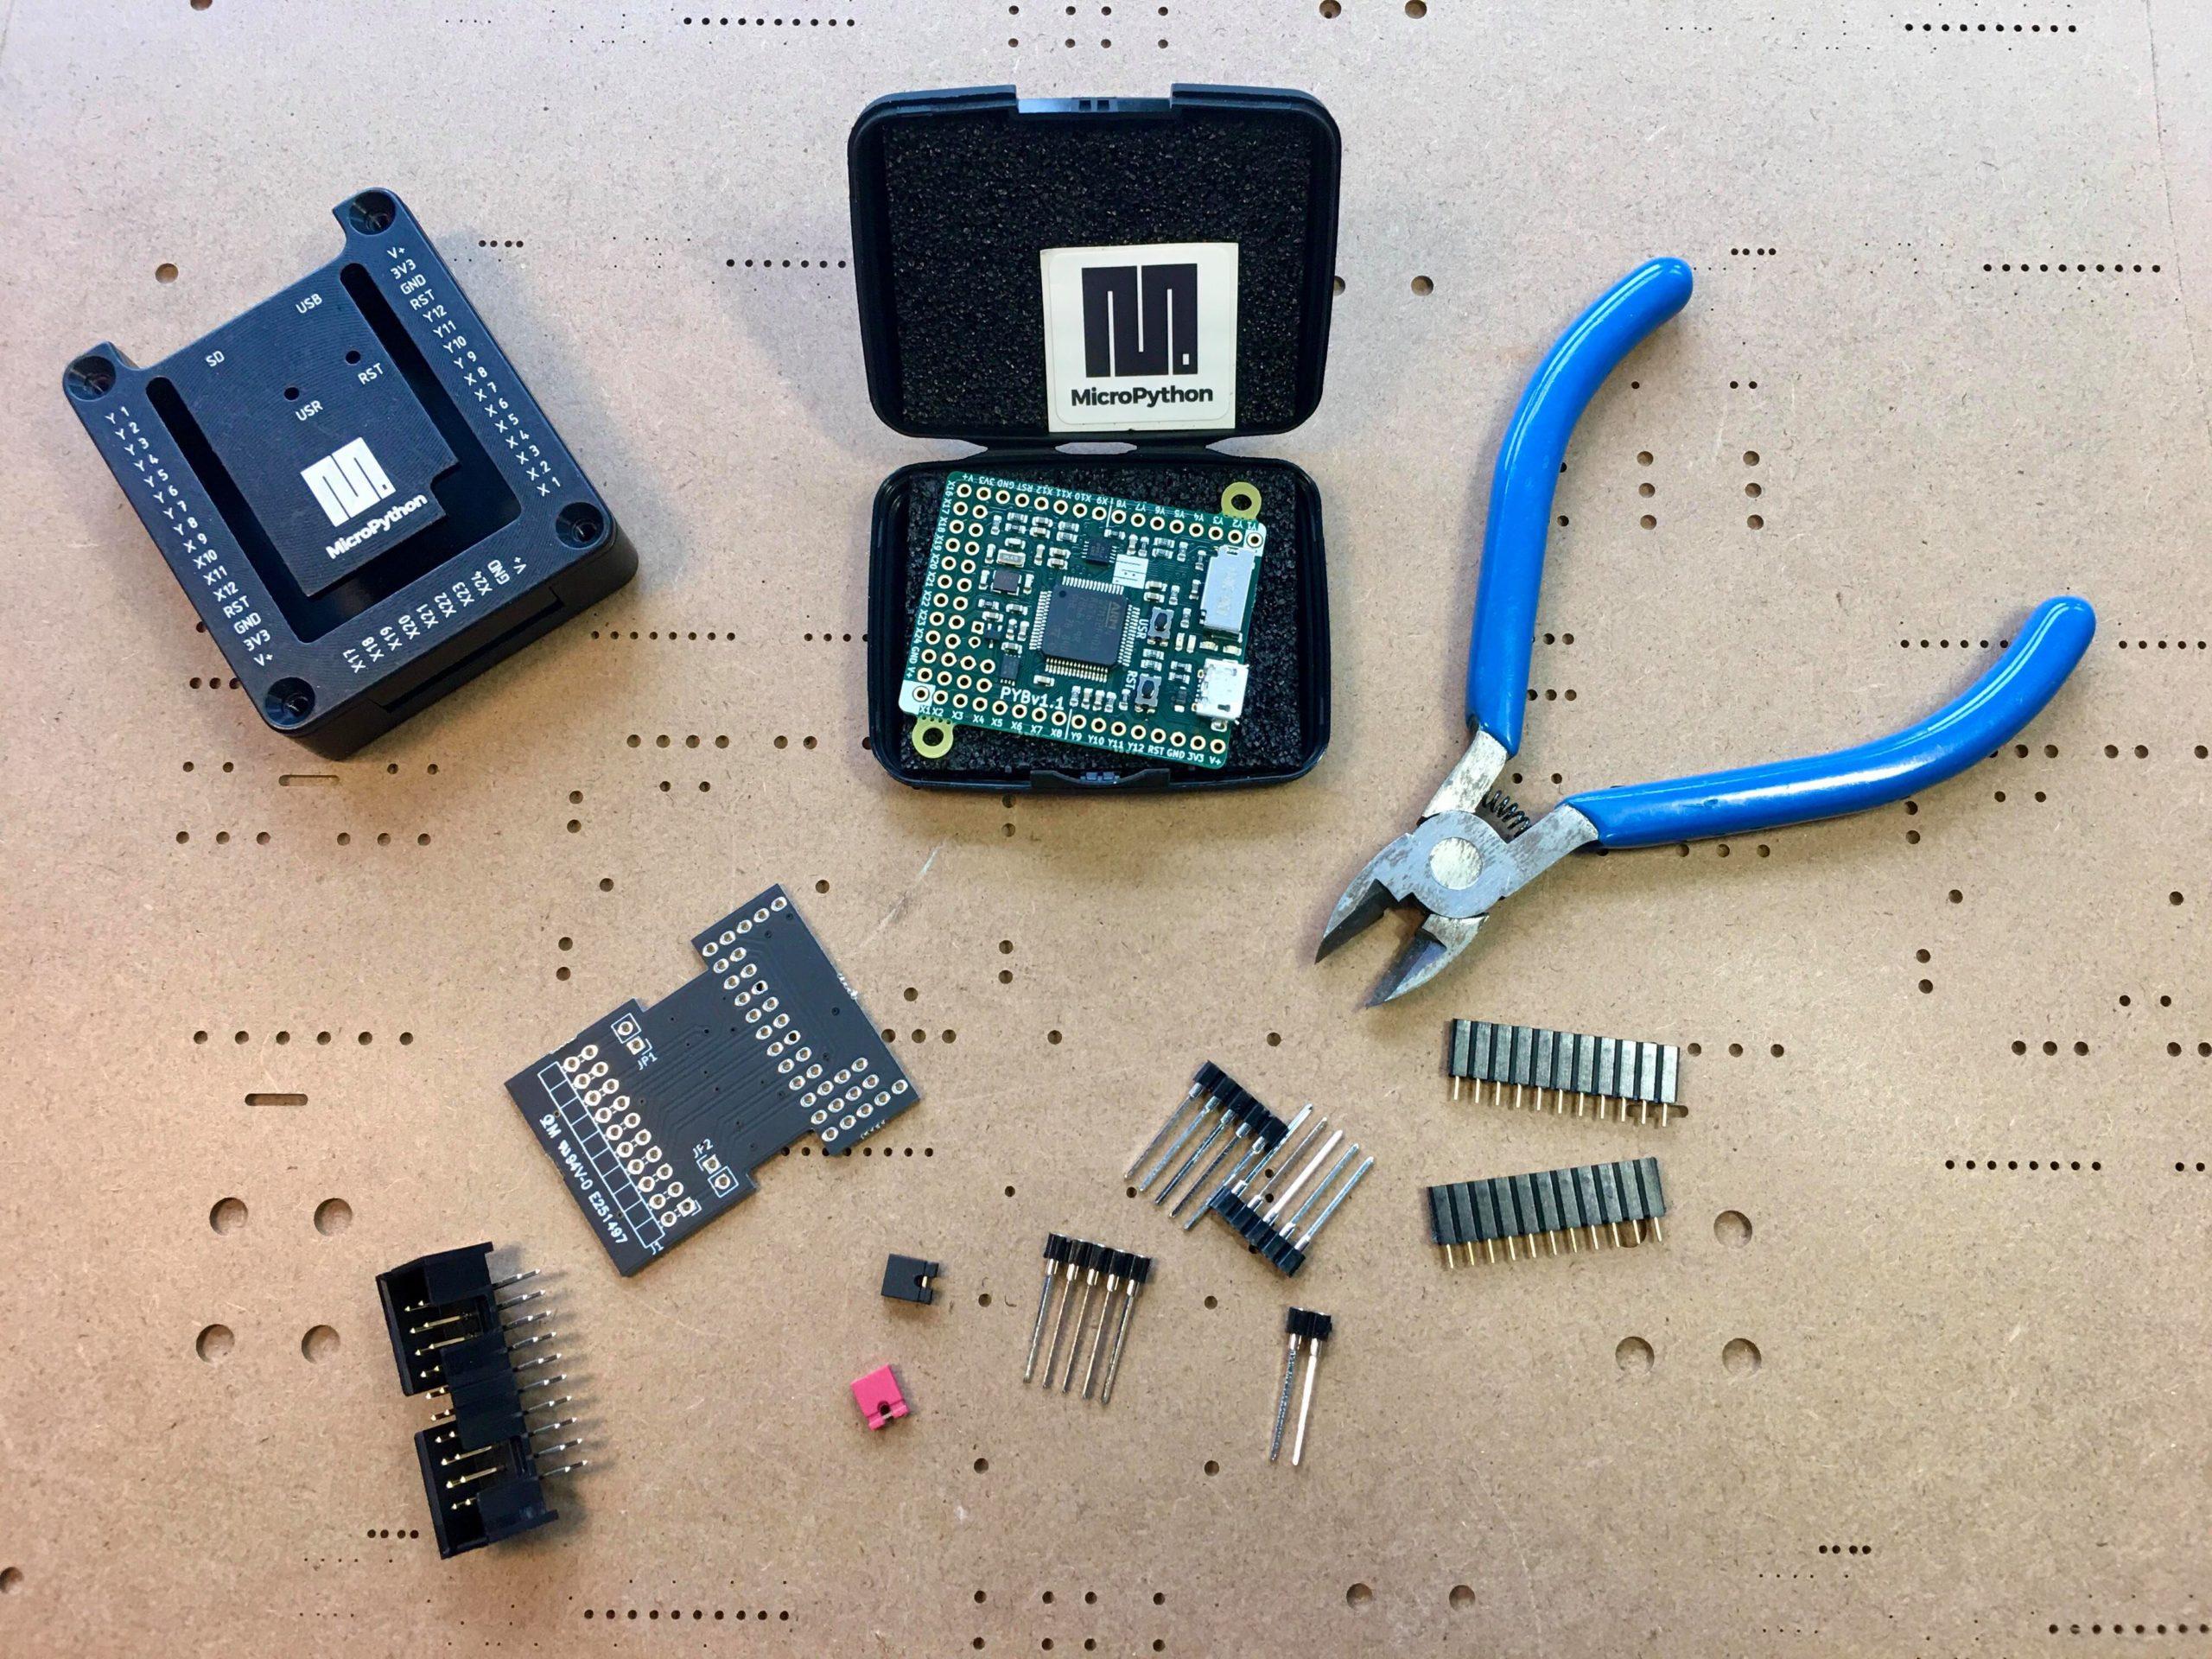 Hyperpanel OS - STM32PY board